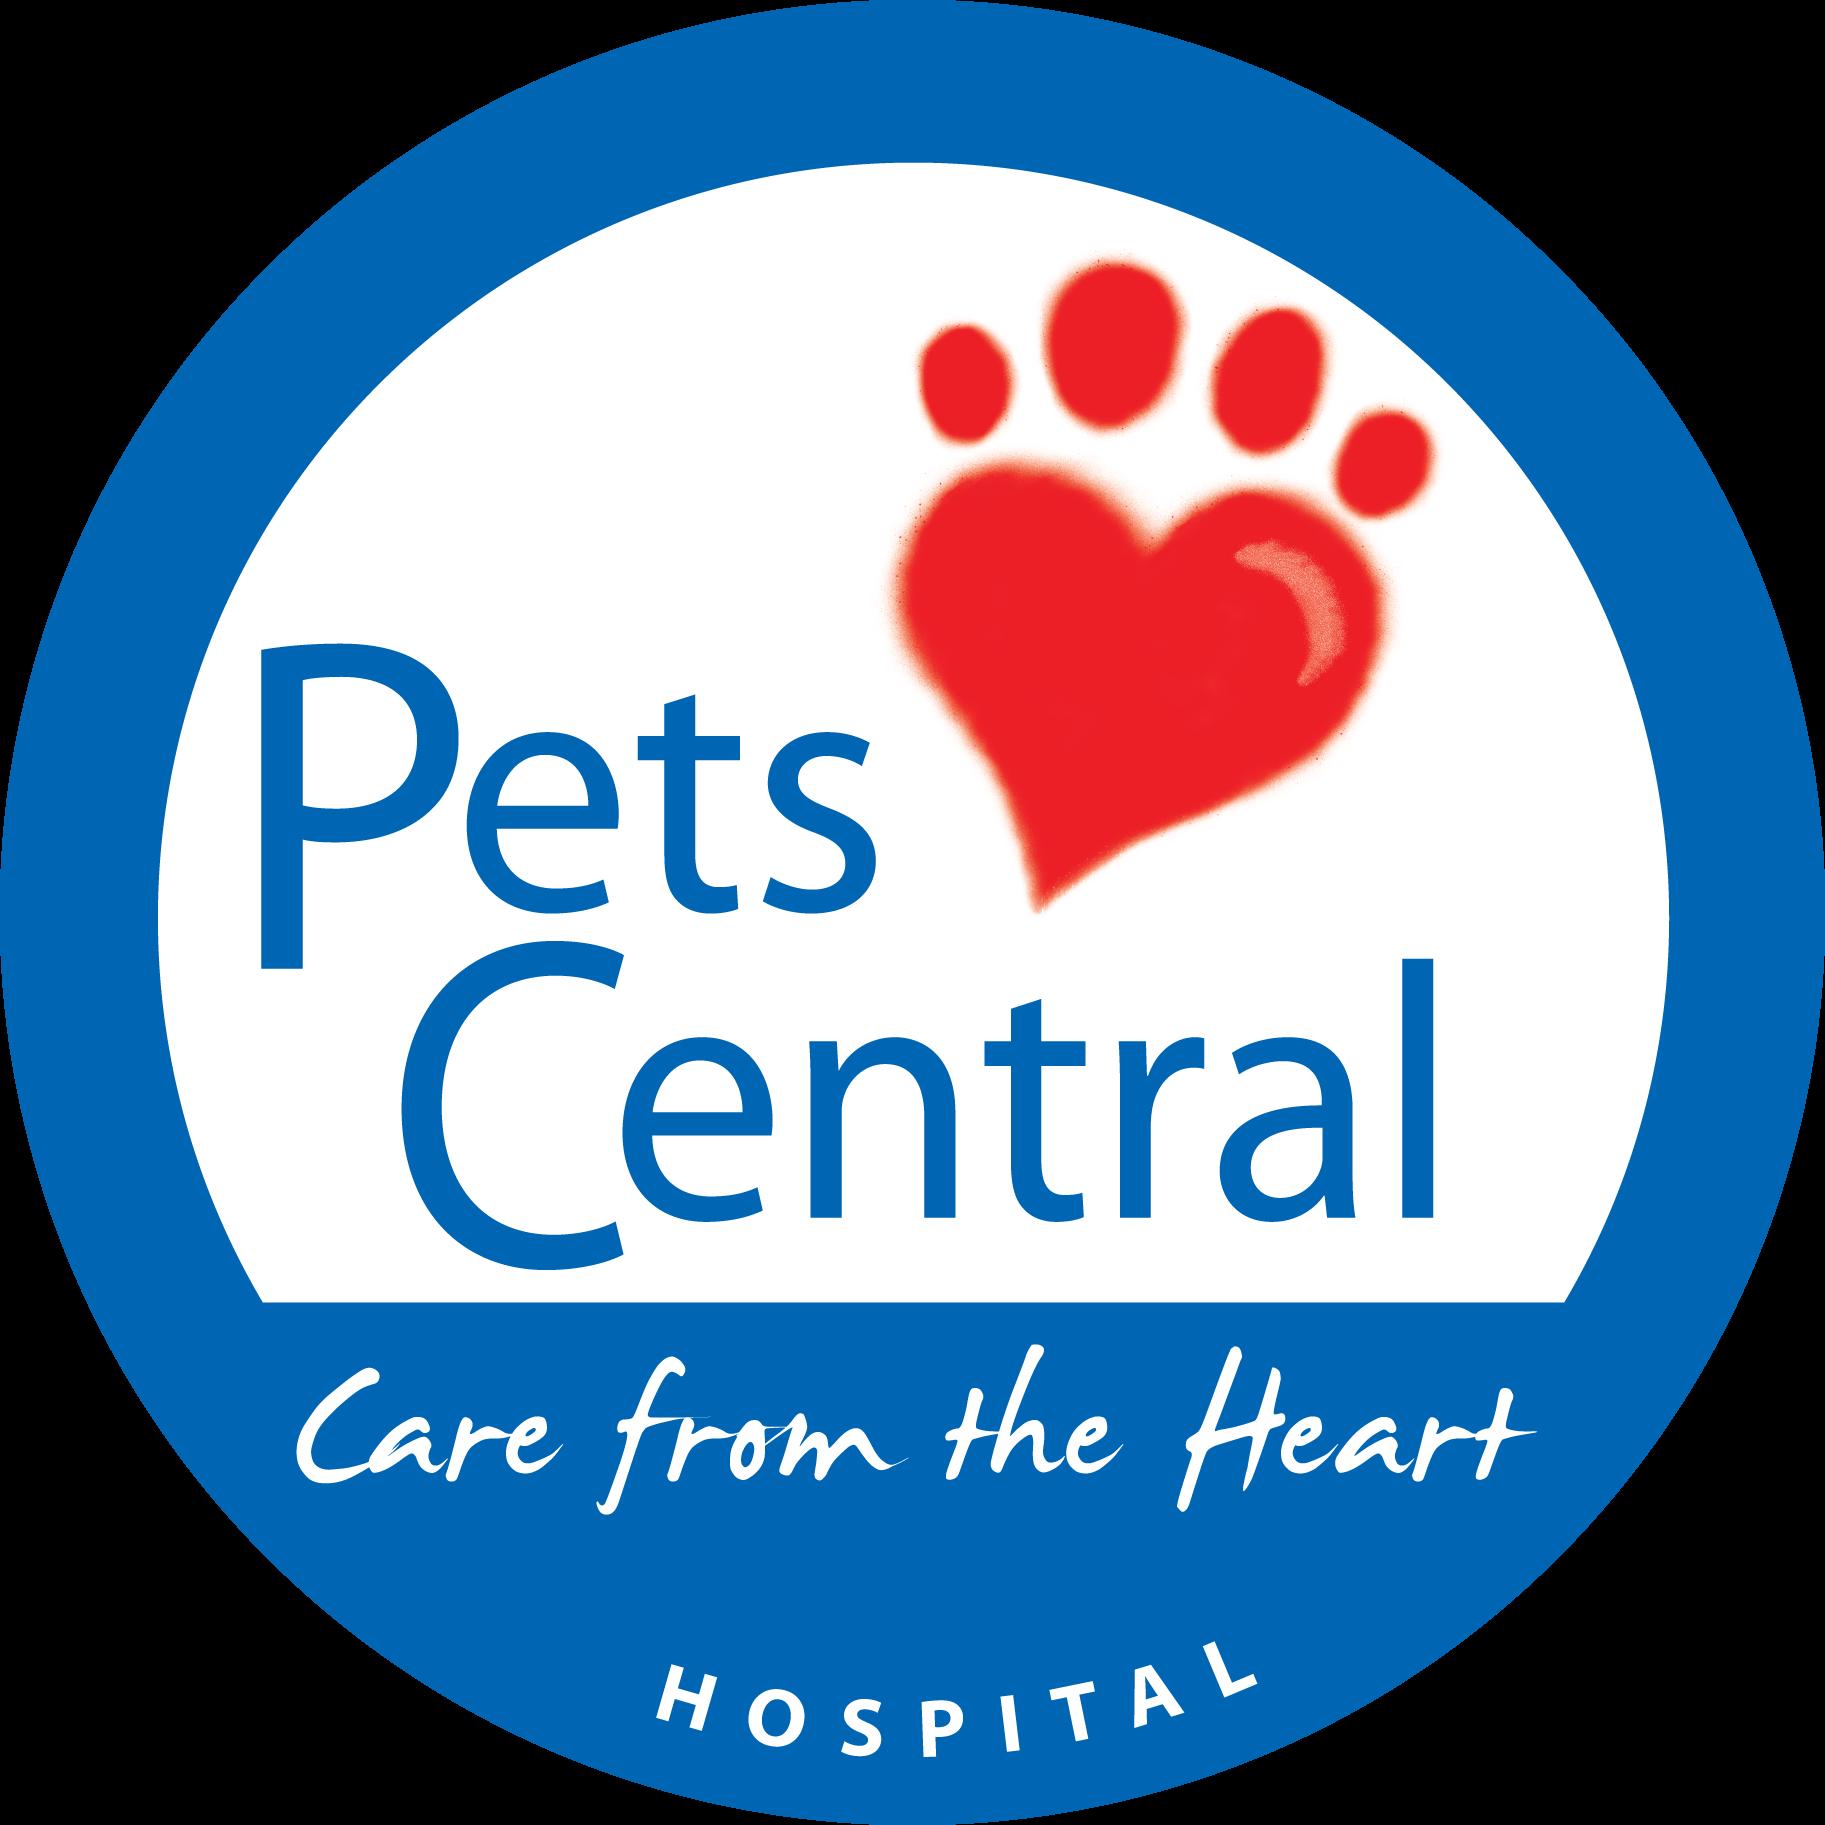 Pets Central